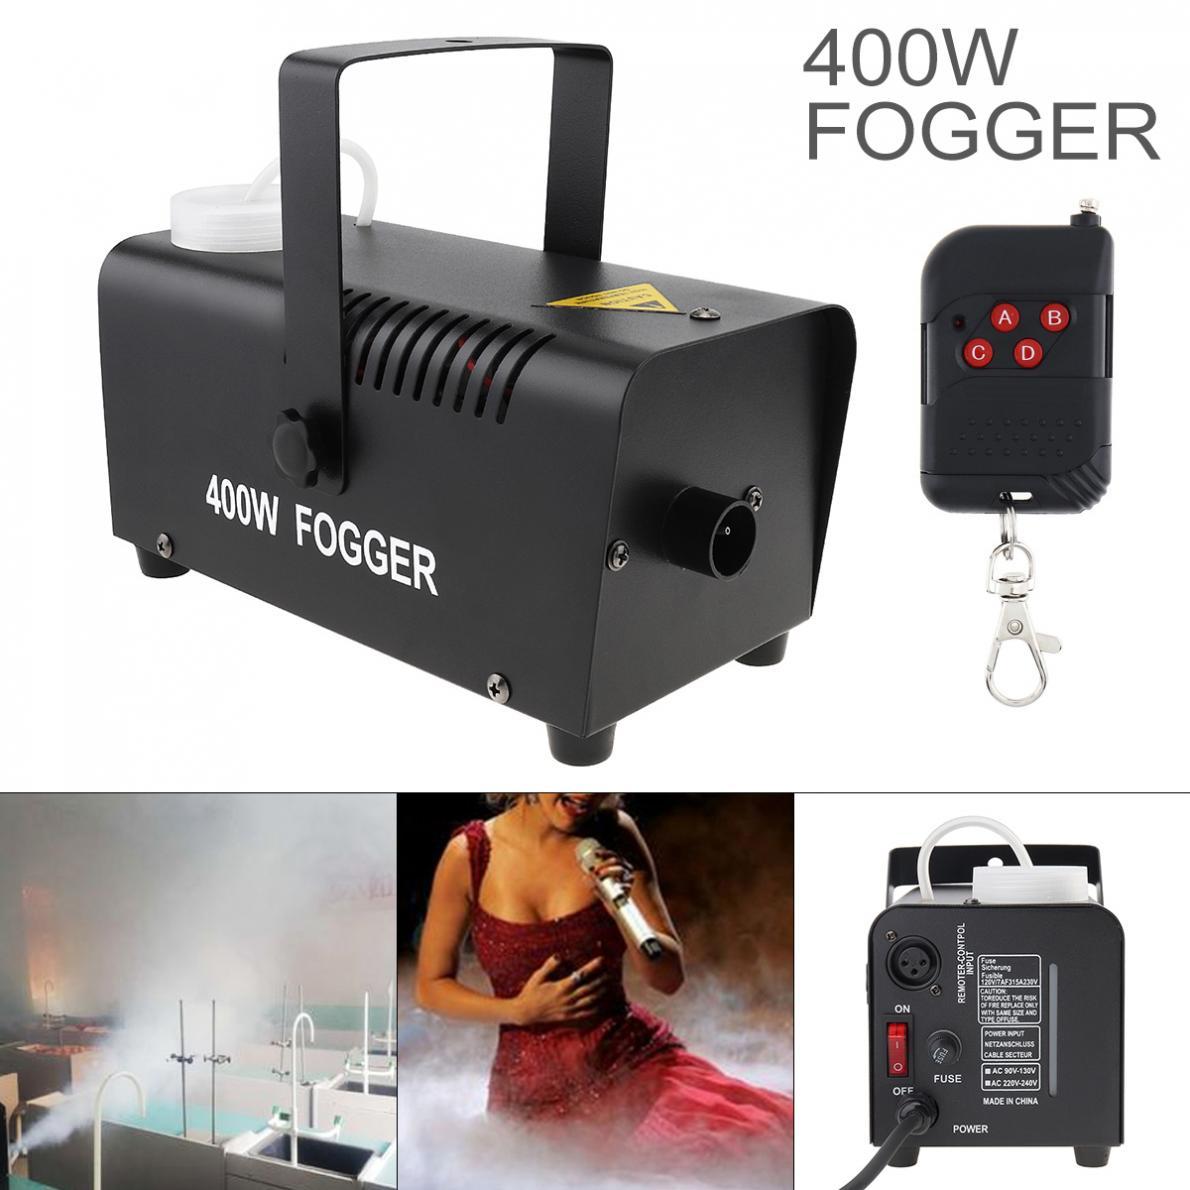 Fog Machine  Wire Control 400W /500W Hood Professional Fog Machine Ejector With Remote Control For Wedding /Stage Fast Shipping